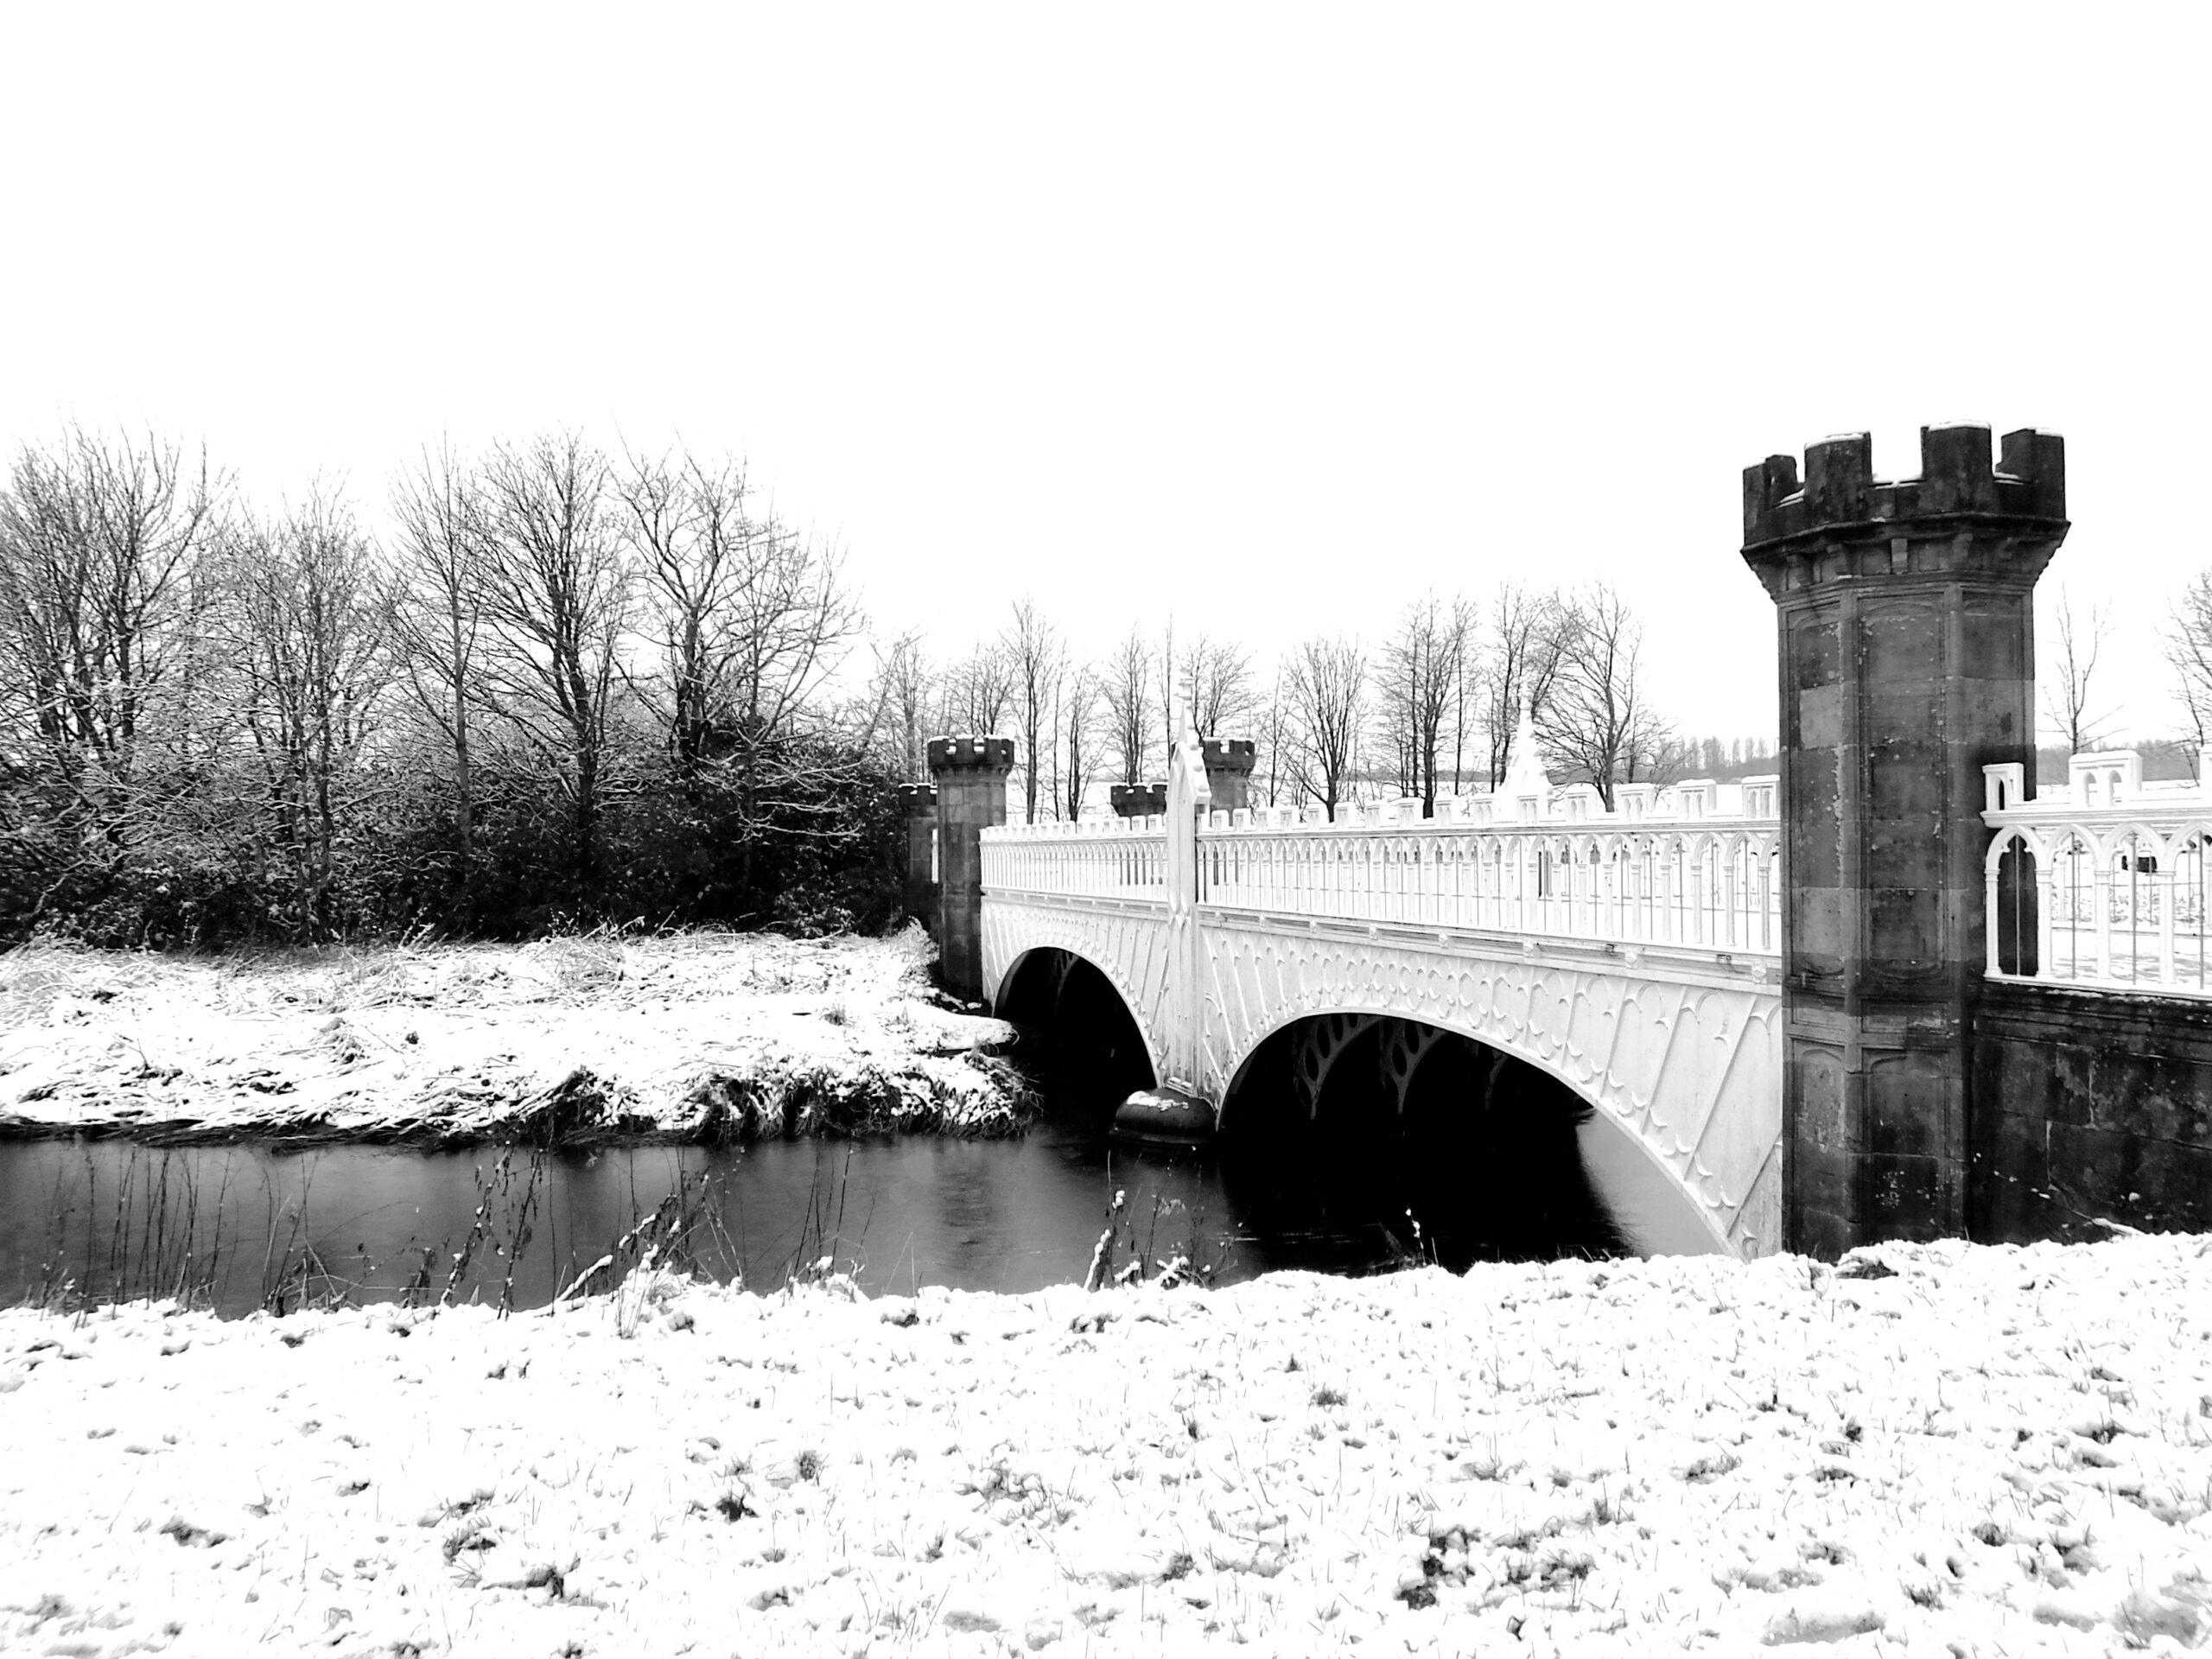 Tournament Bridge